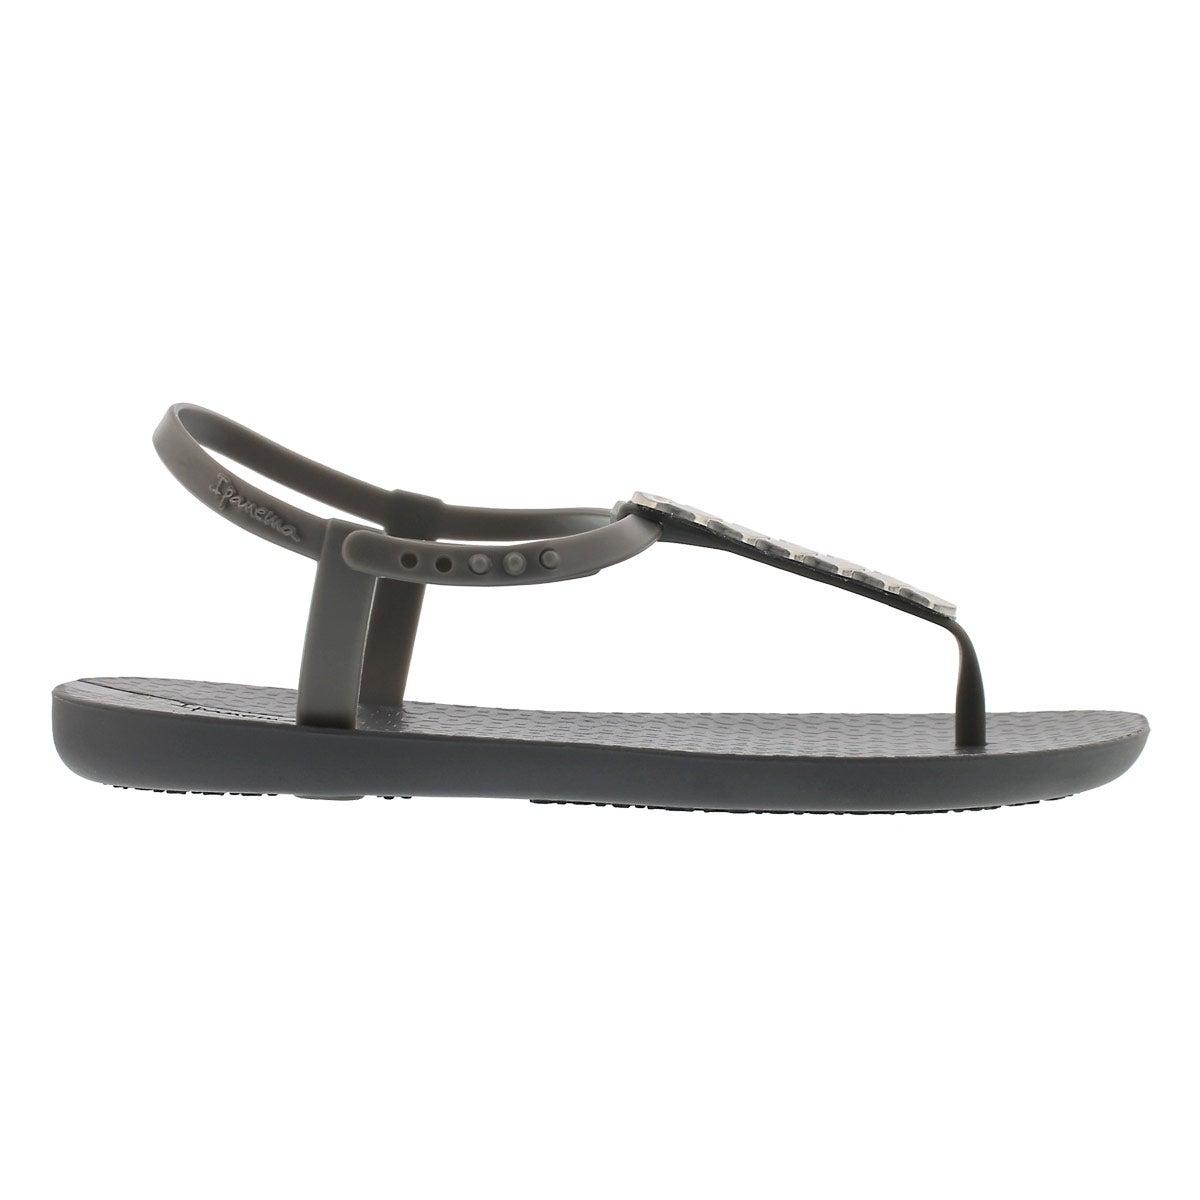 Lds Charm IV Sand grey t-strap sandal